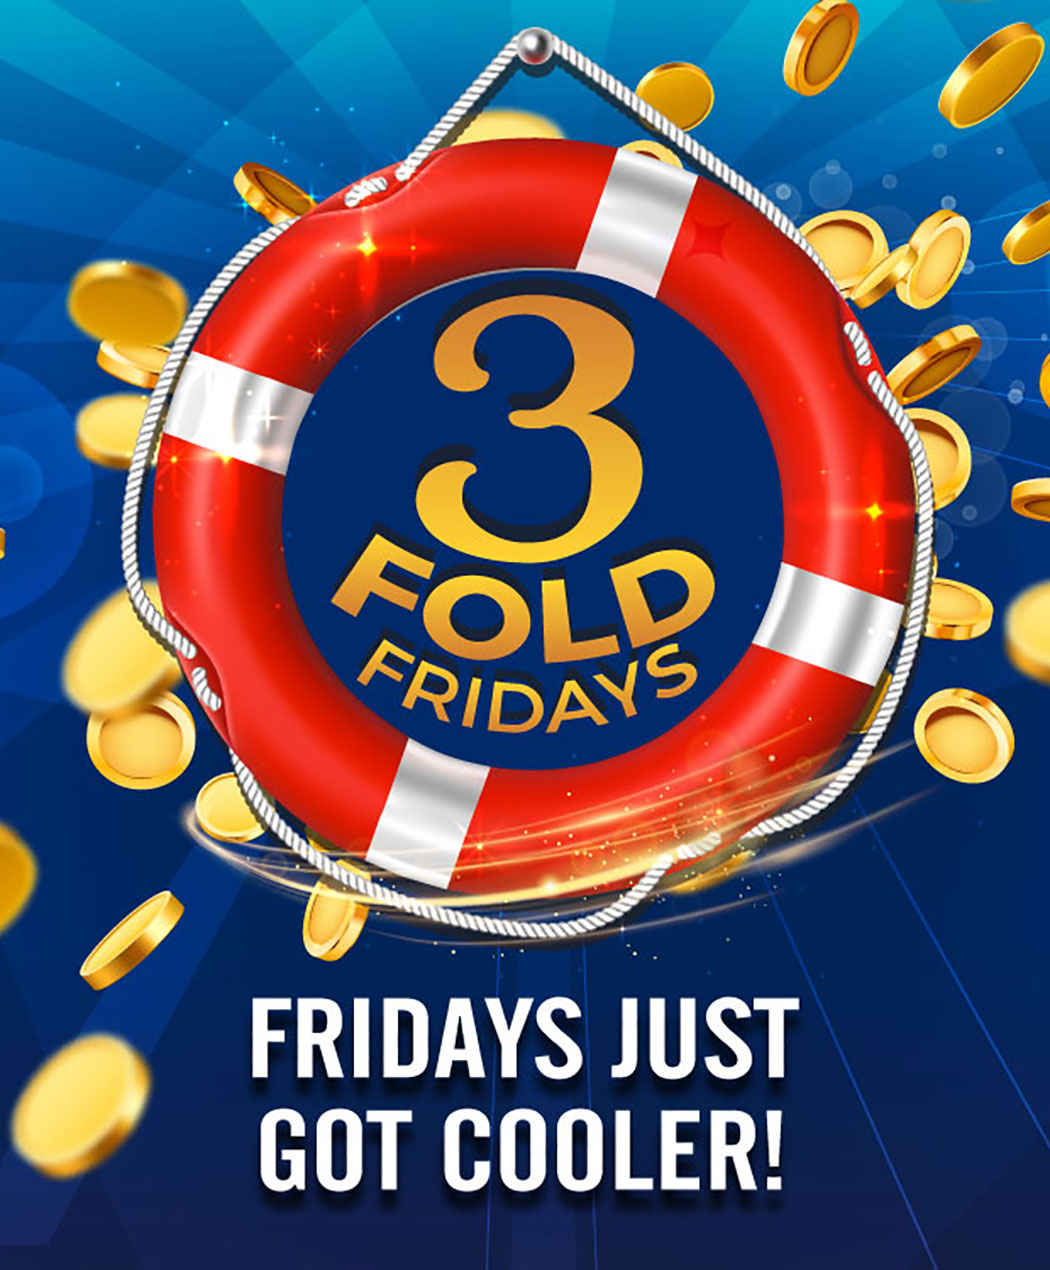 3 Fold Fridays